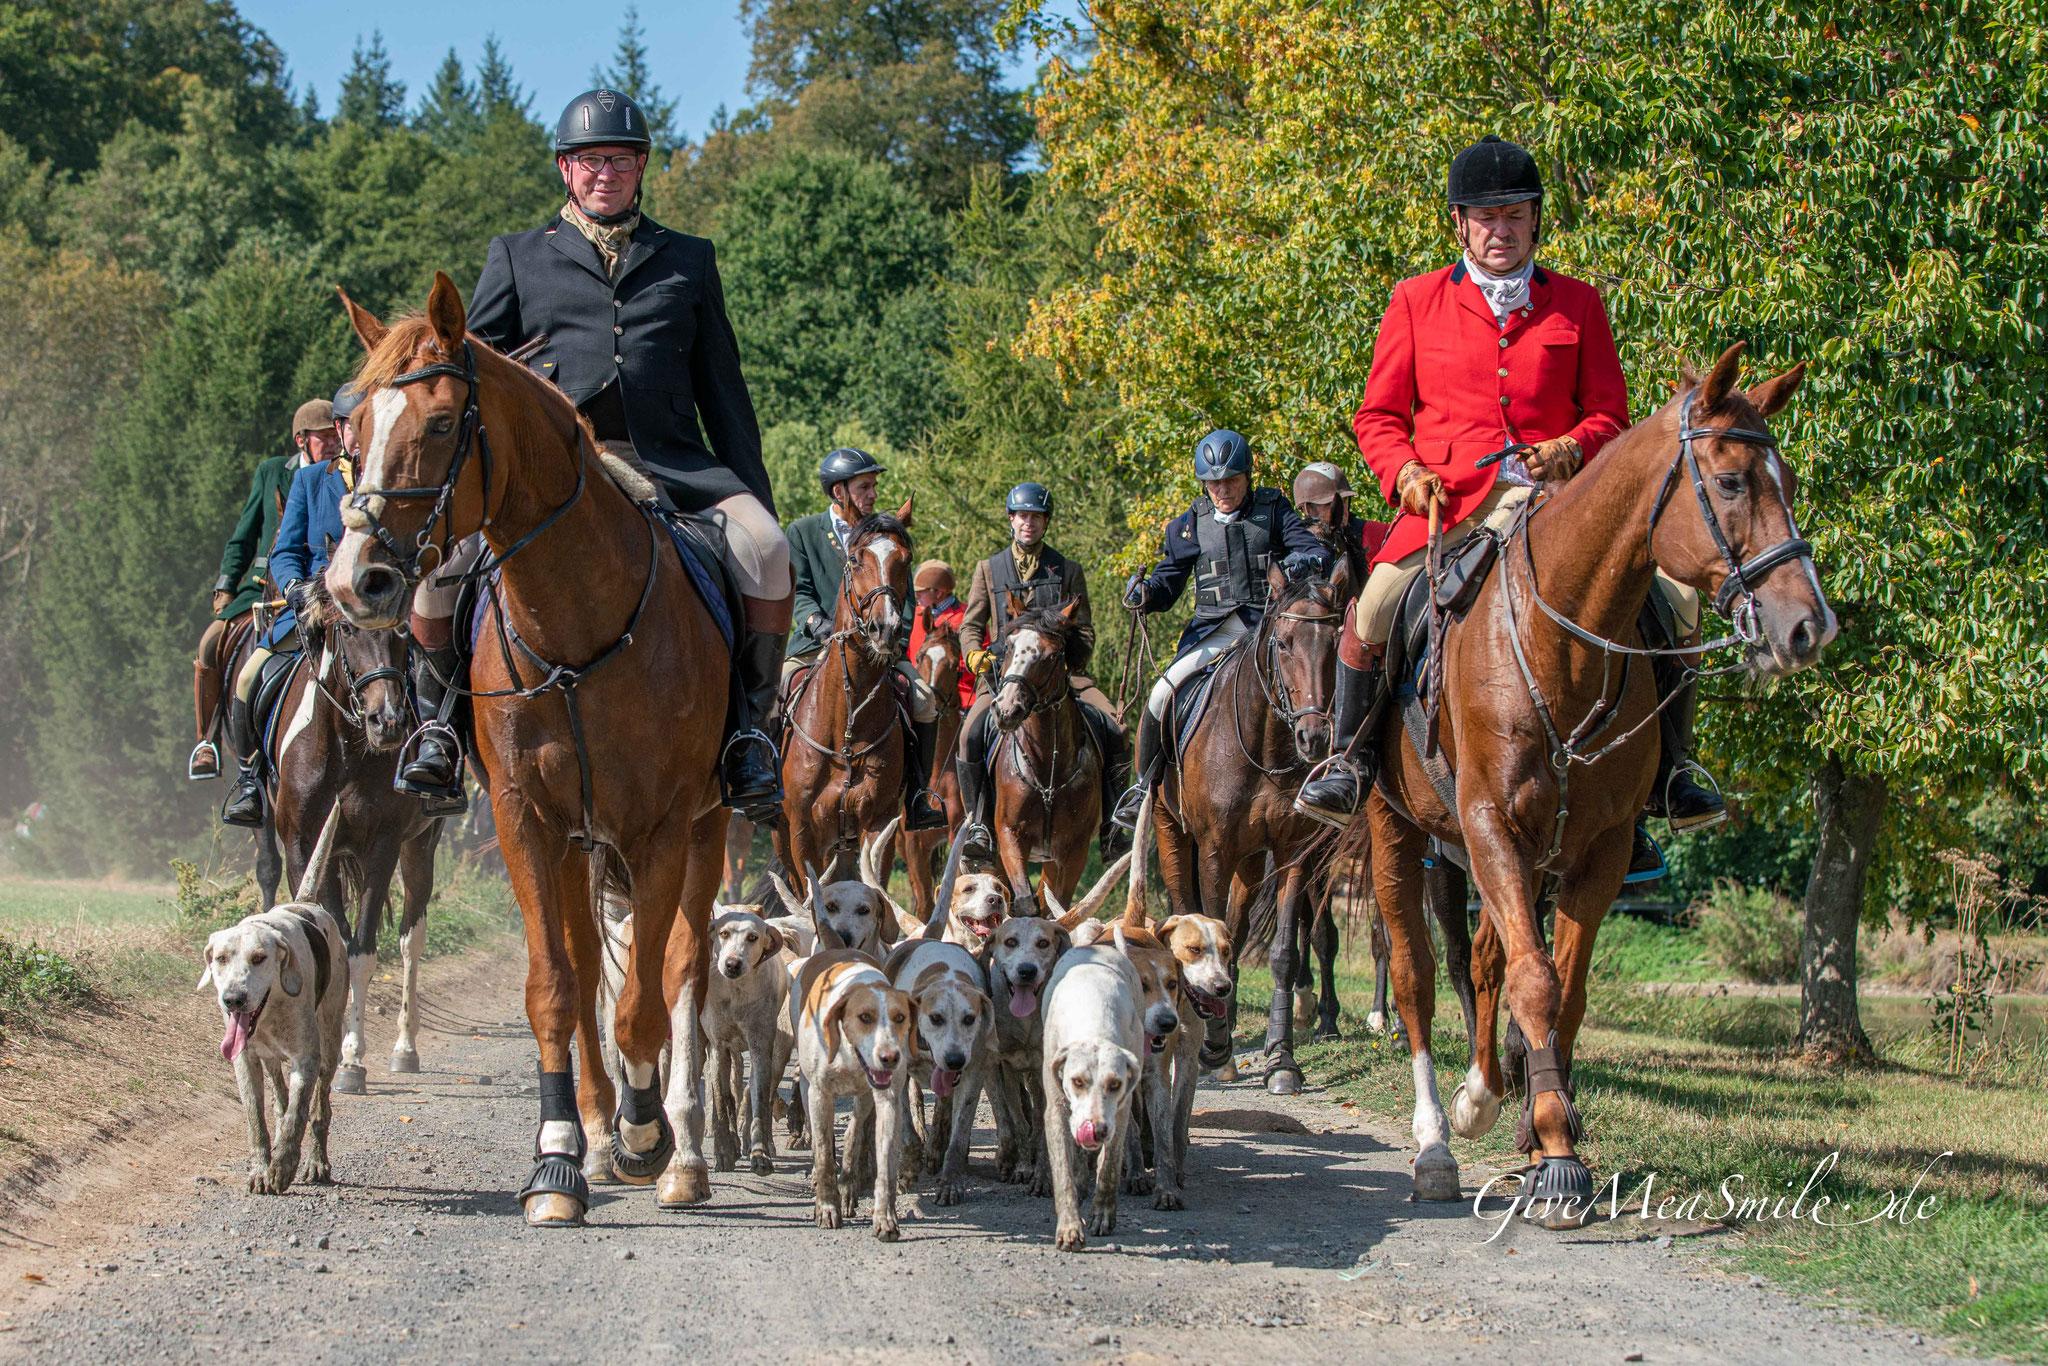 Schleppjagdfotos Jagdfotos von www.givemeasmile.de   Peter Jäger